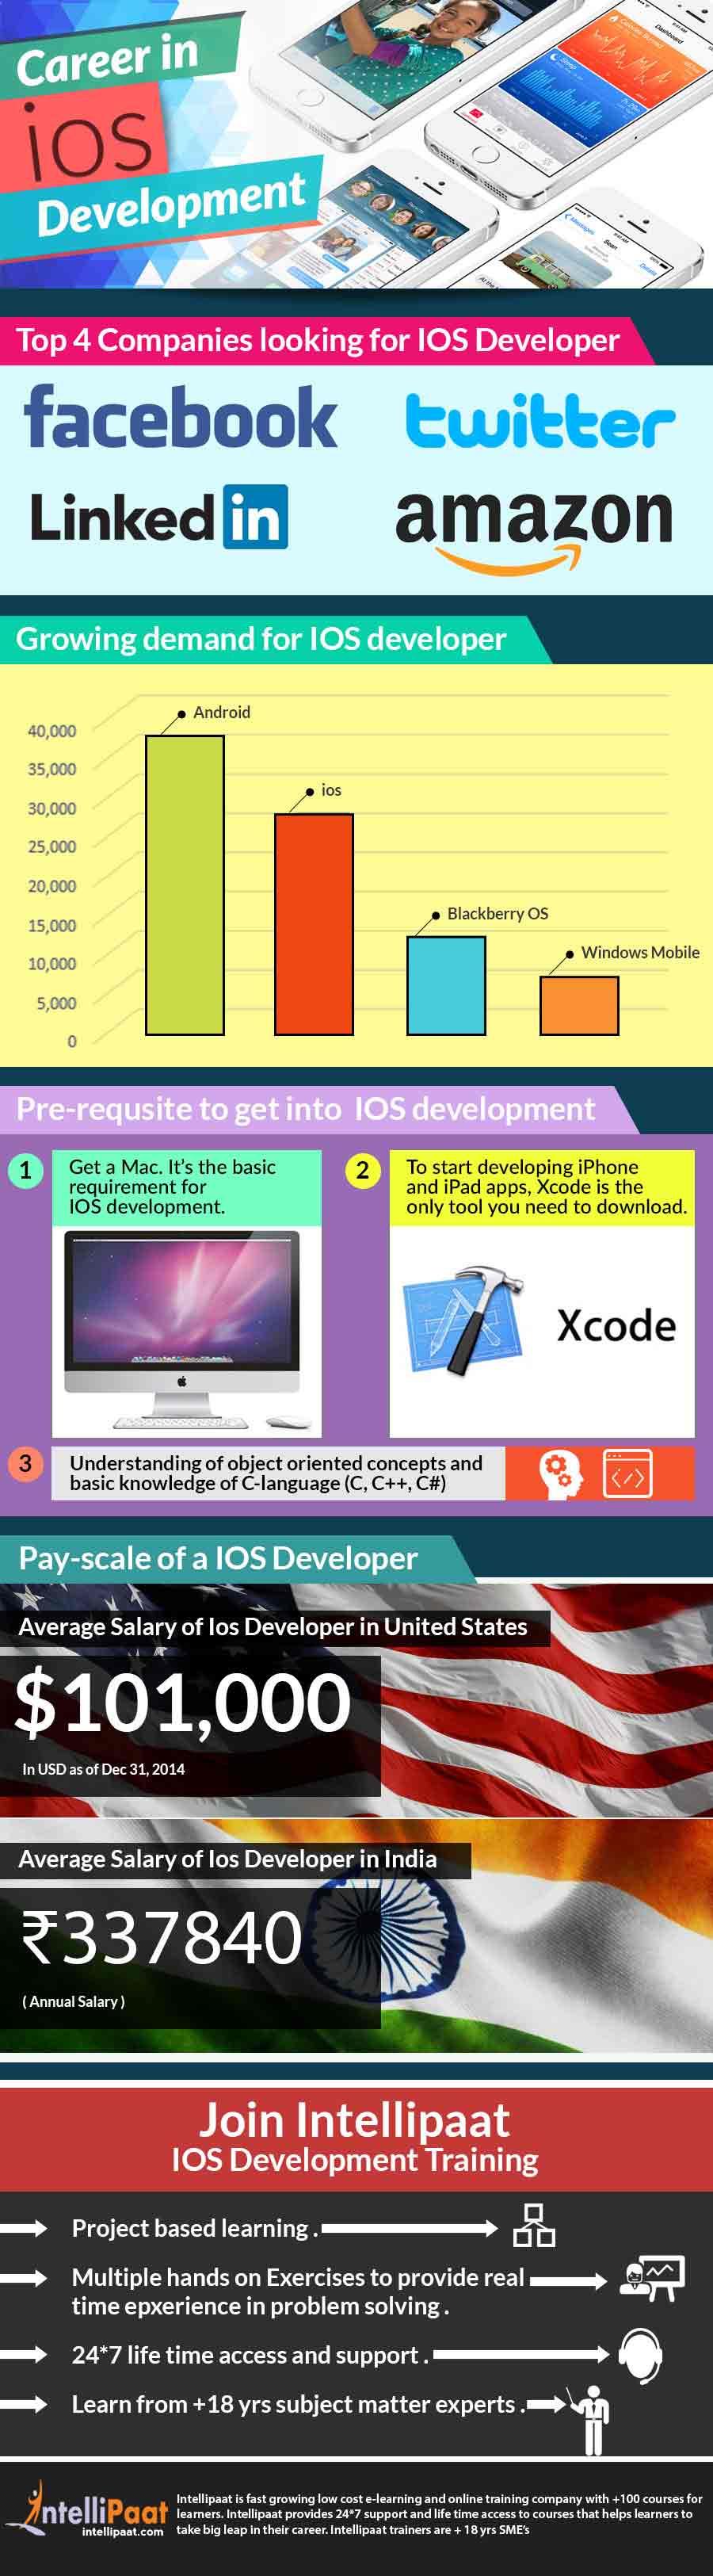 Career-in-IOS-Development